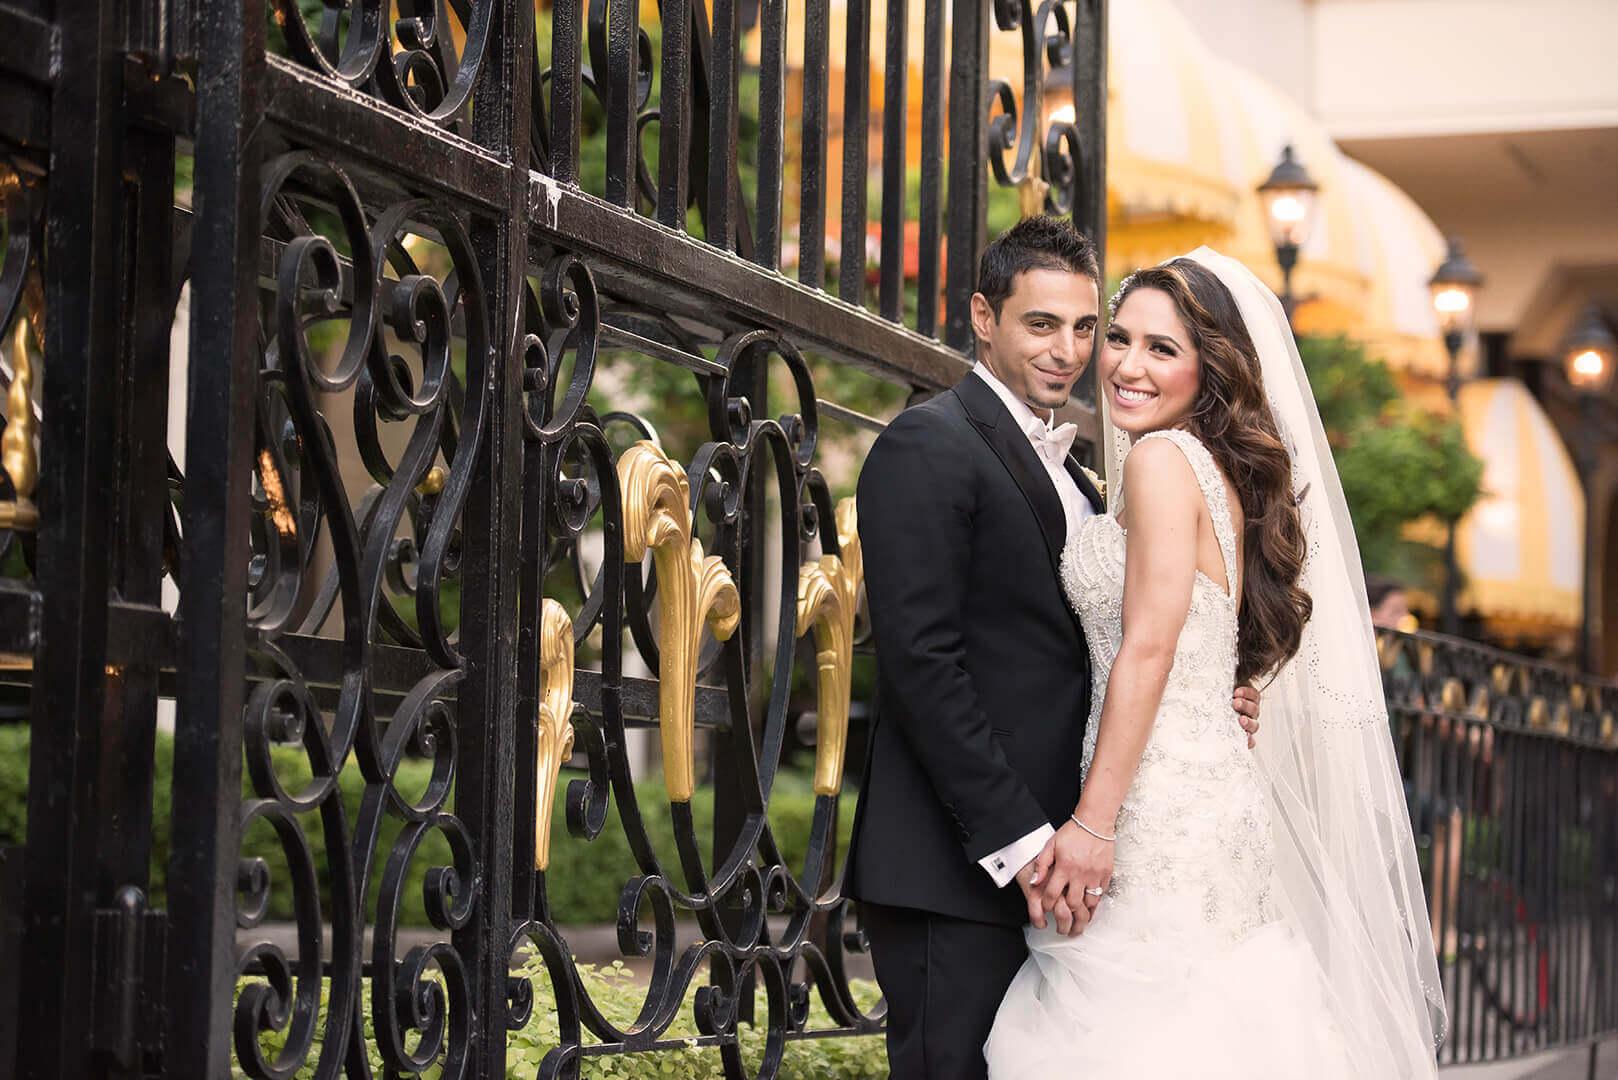 20_KLK Photography_Beverly Wilshire Wedding_Beverly Hills Wedding Photographer